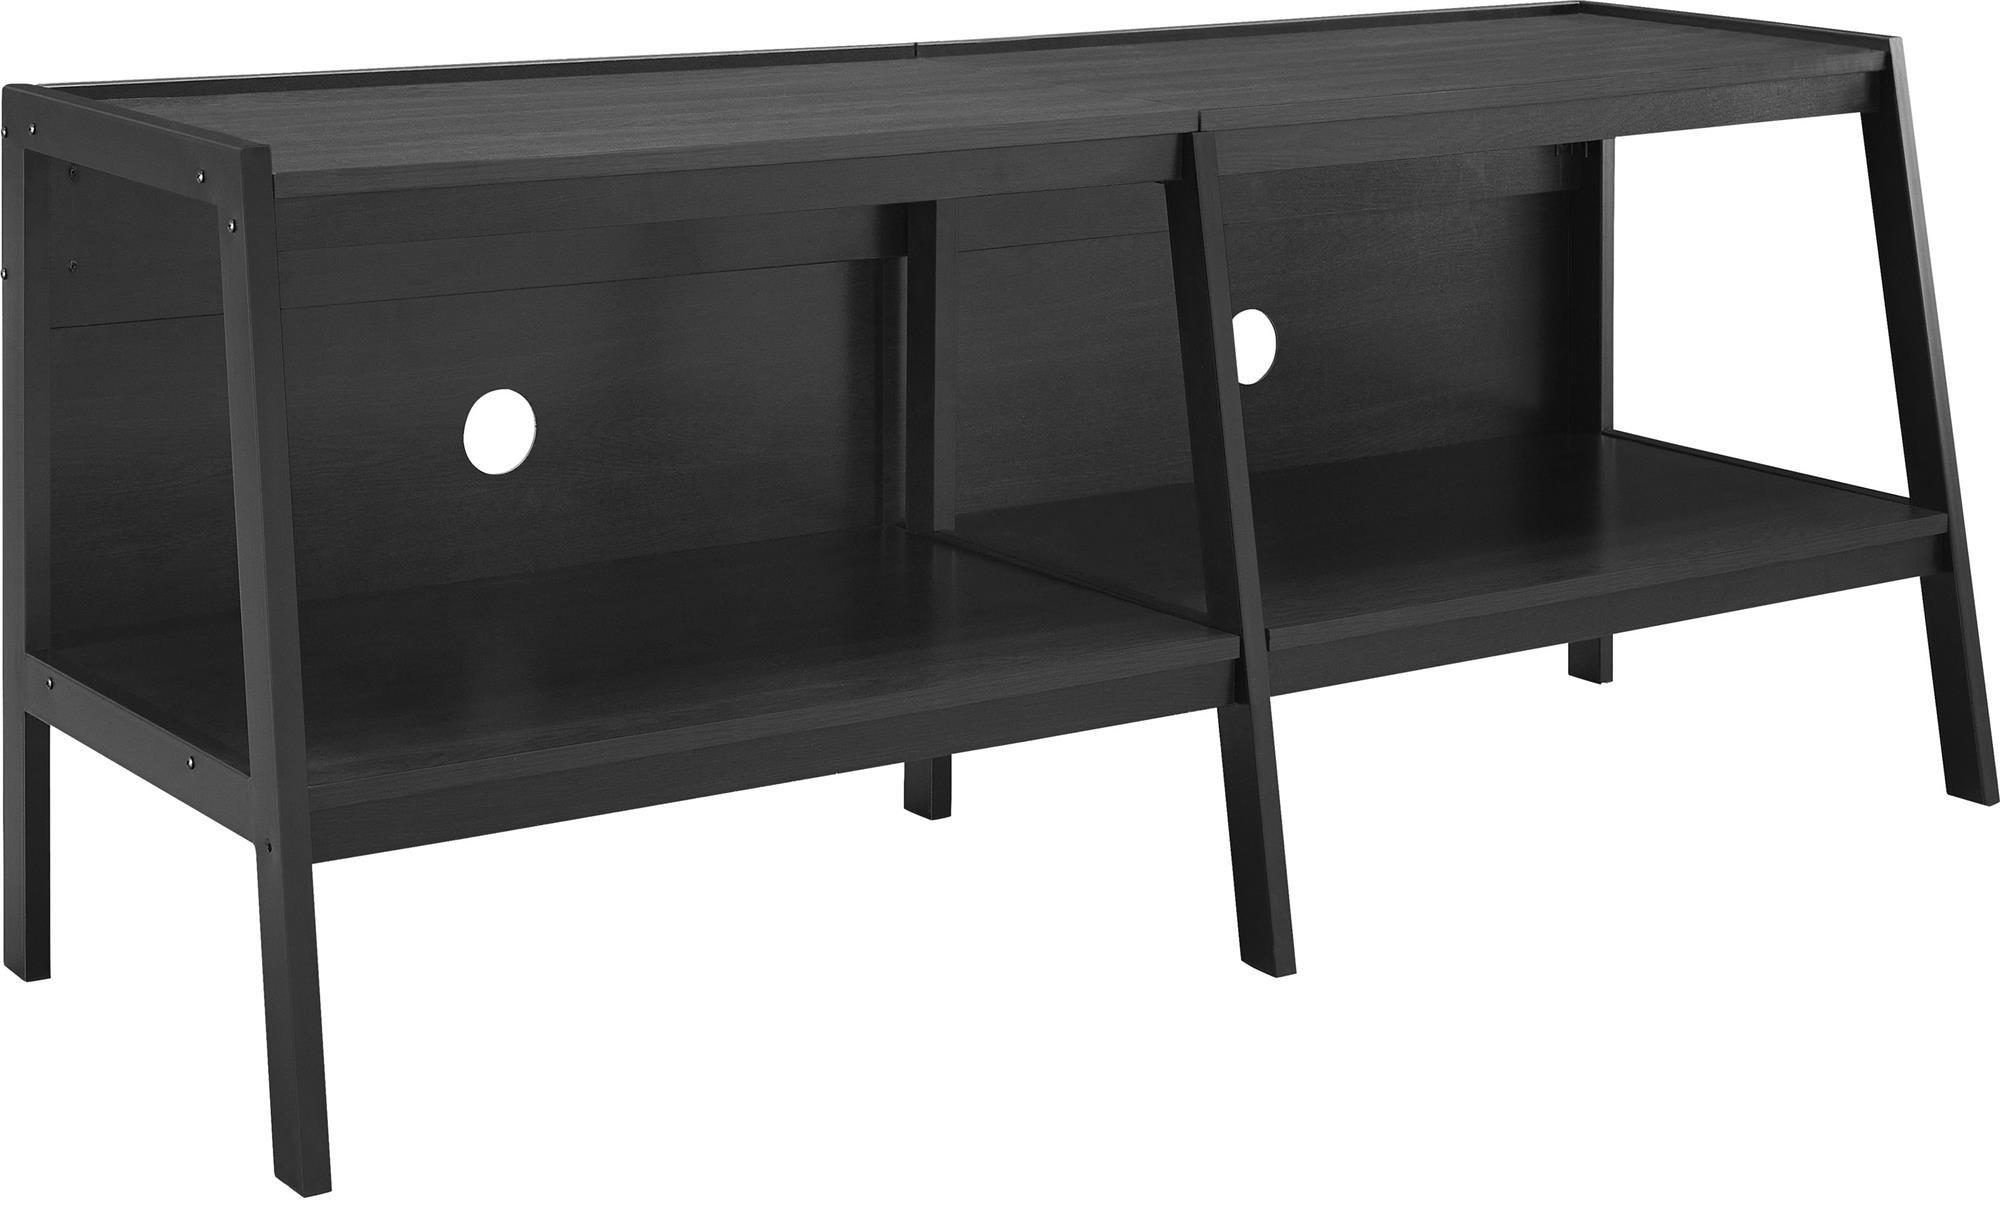 Ameriwood Home Altra Furniture Ladder Entertainment Center TV Stand, 60'', Black